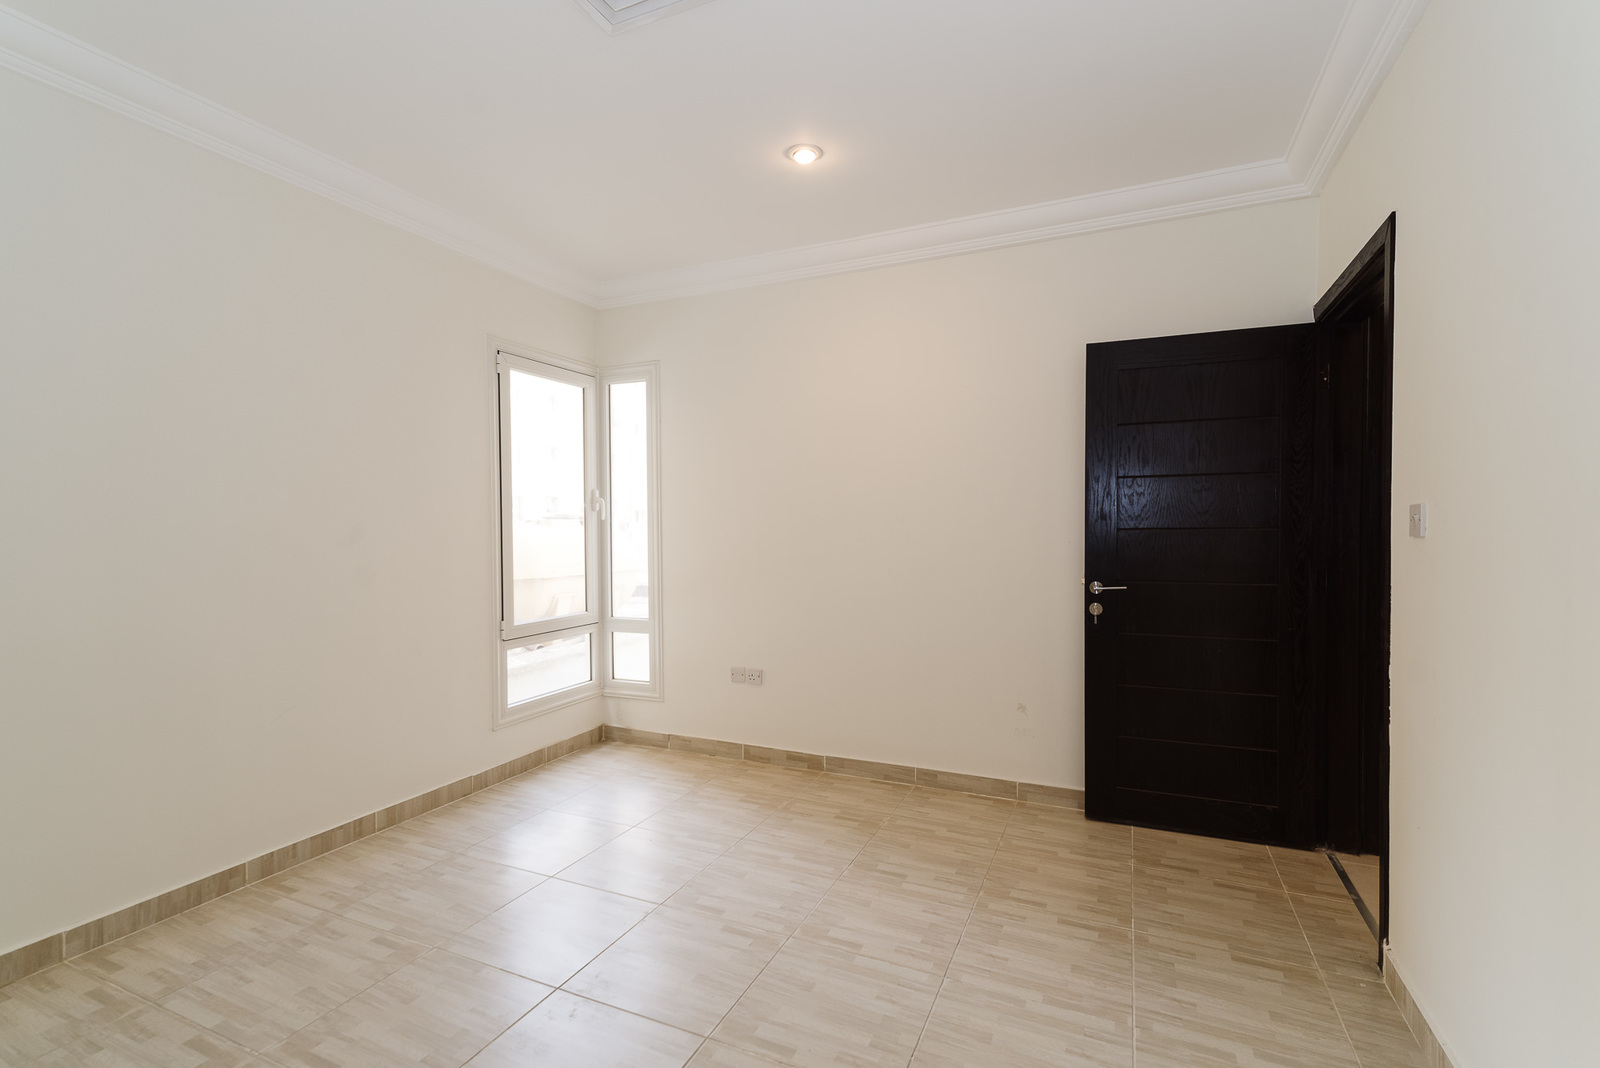 Salmiya – brand new, unfurnished two bedroom apartments